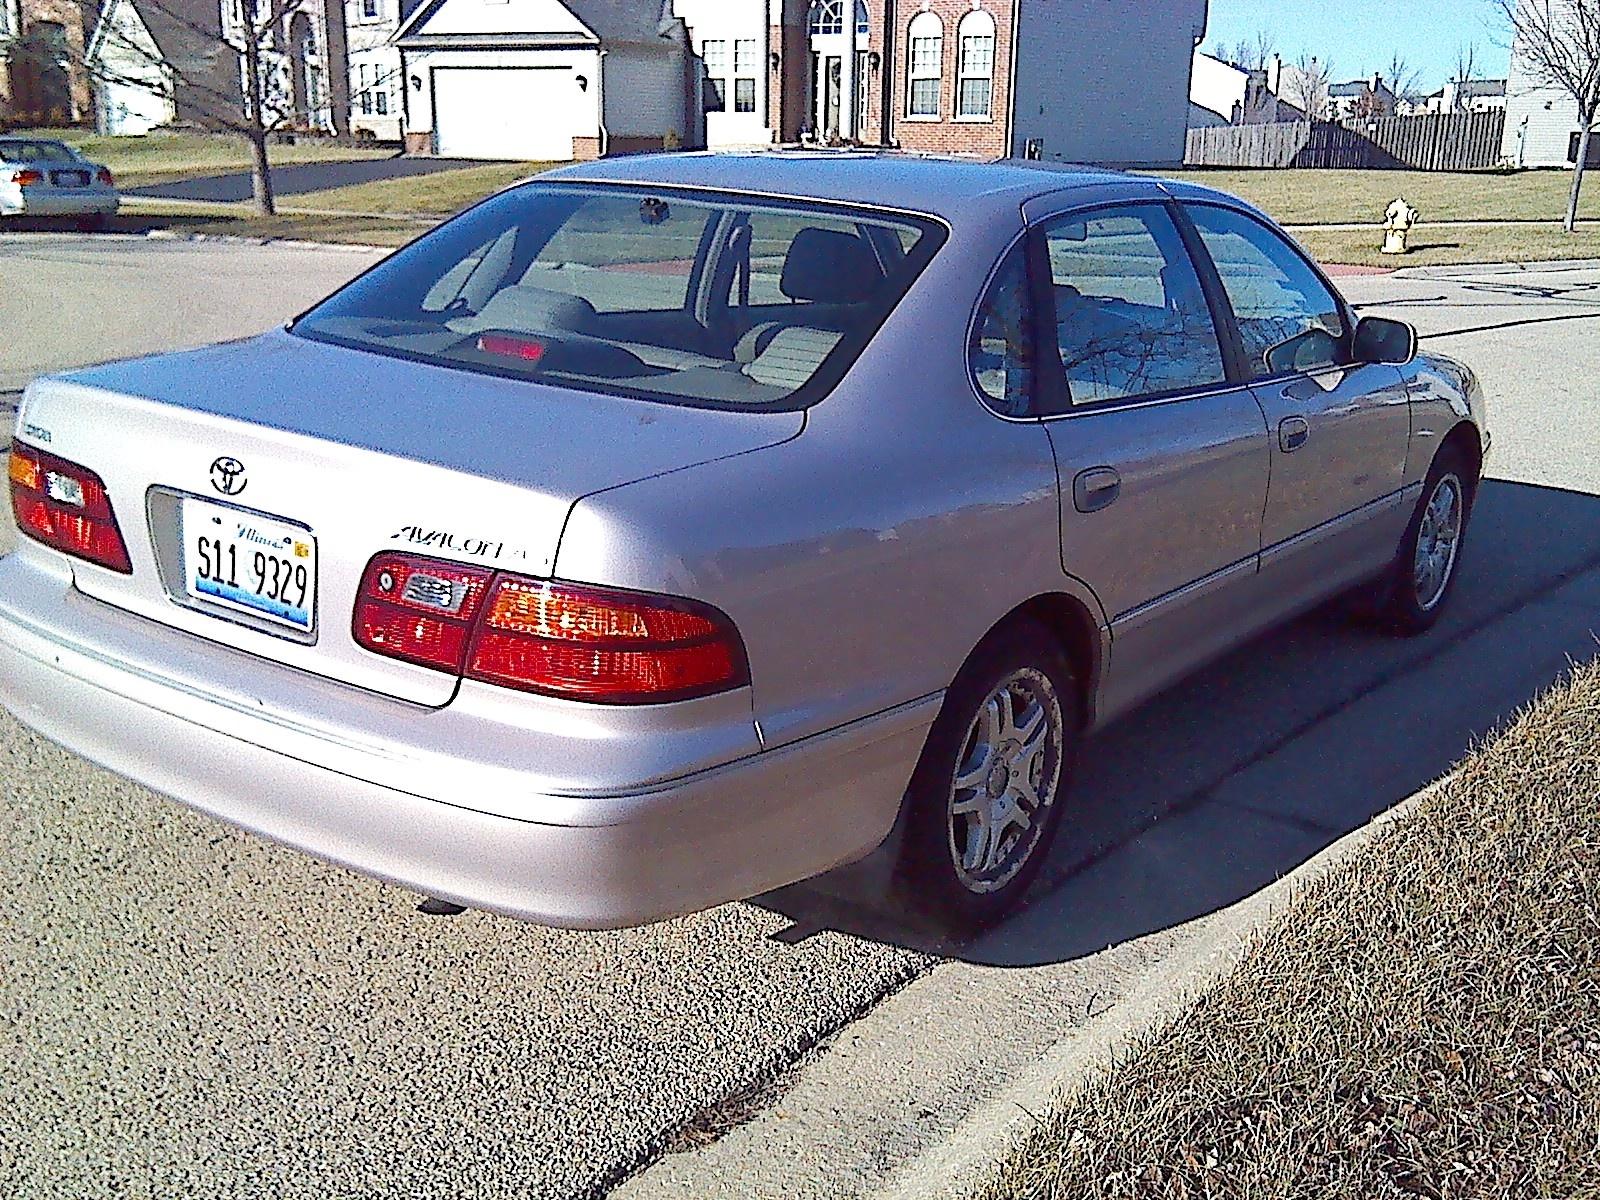 Picture of 1998 Toyota Avalon 4 Dr XLS Sedan, exterior